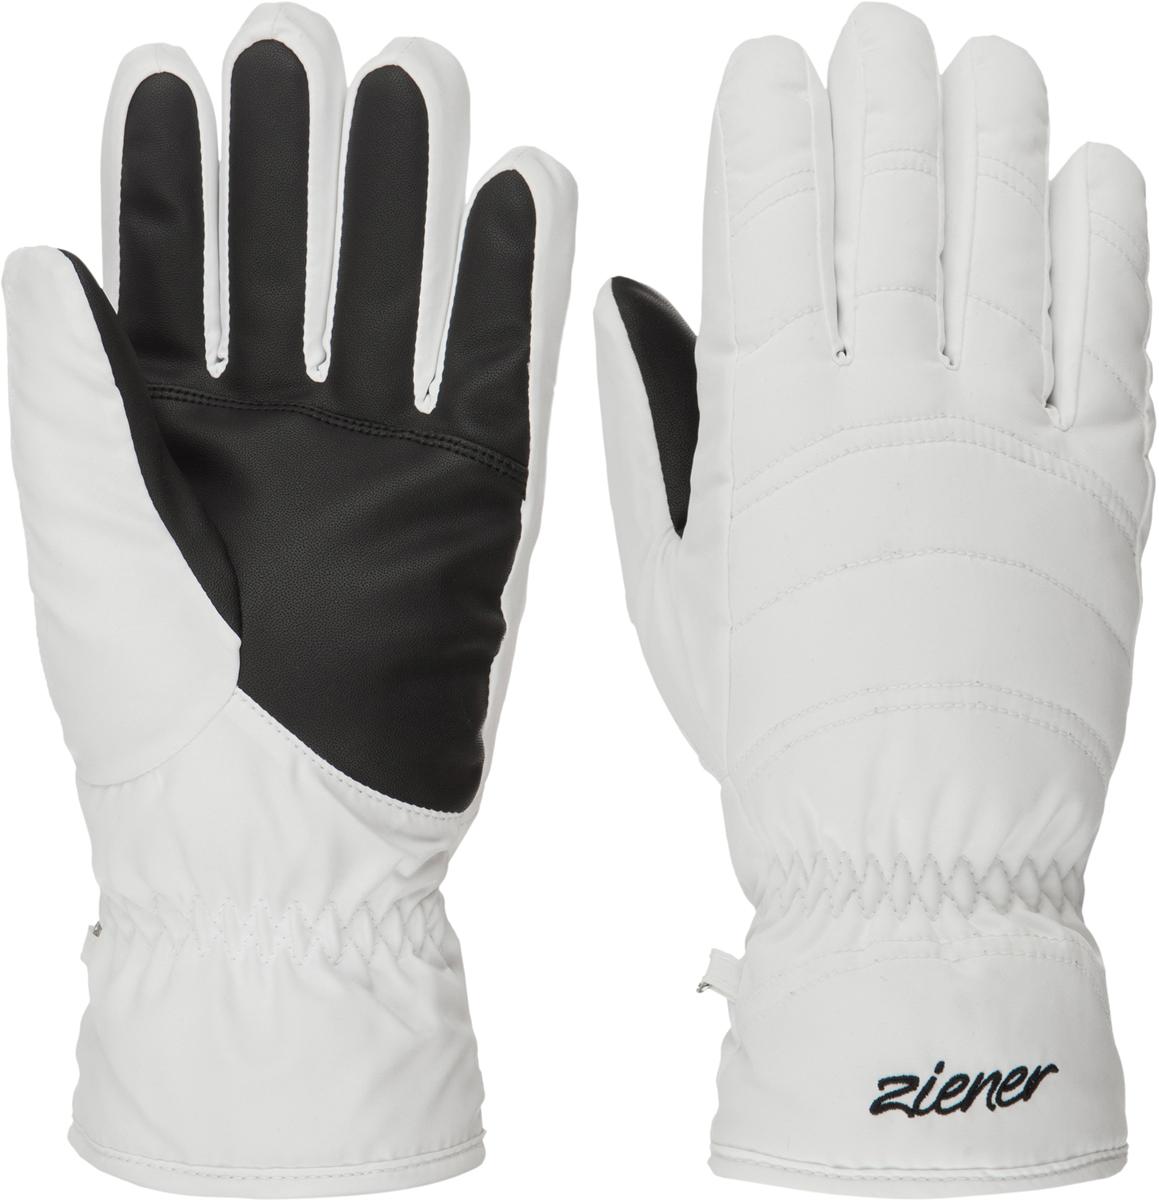 Перчатки женские Ziener Kamira Sm Lady Glove, цвет: белый. 170020-01. Размер 7170020-01